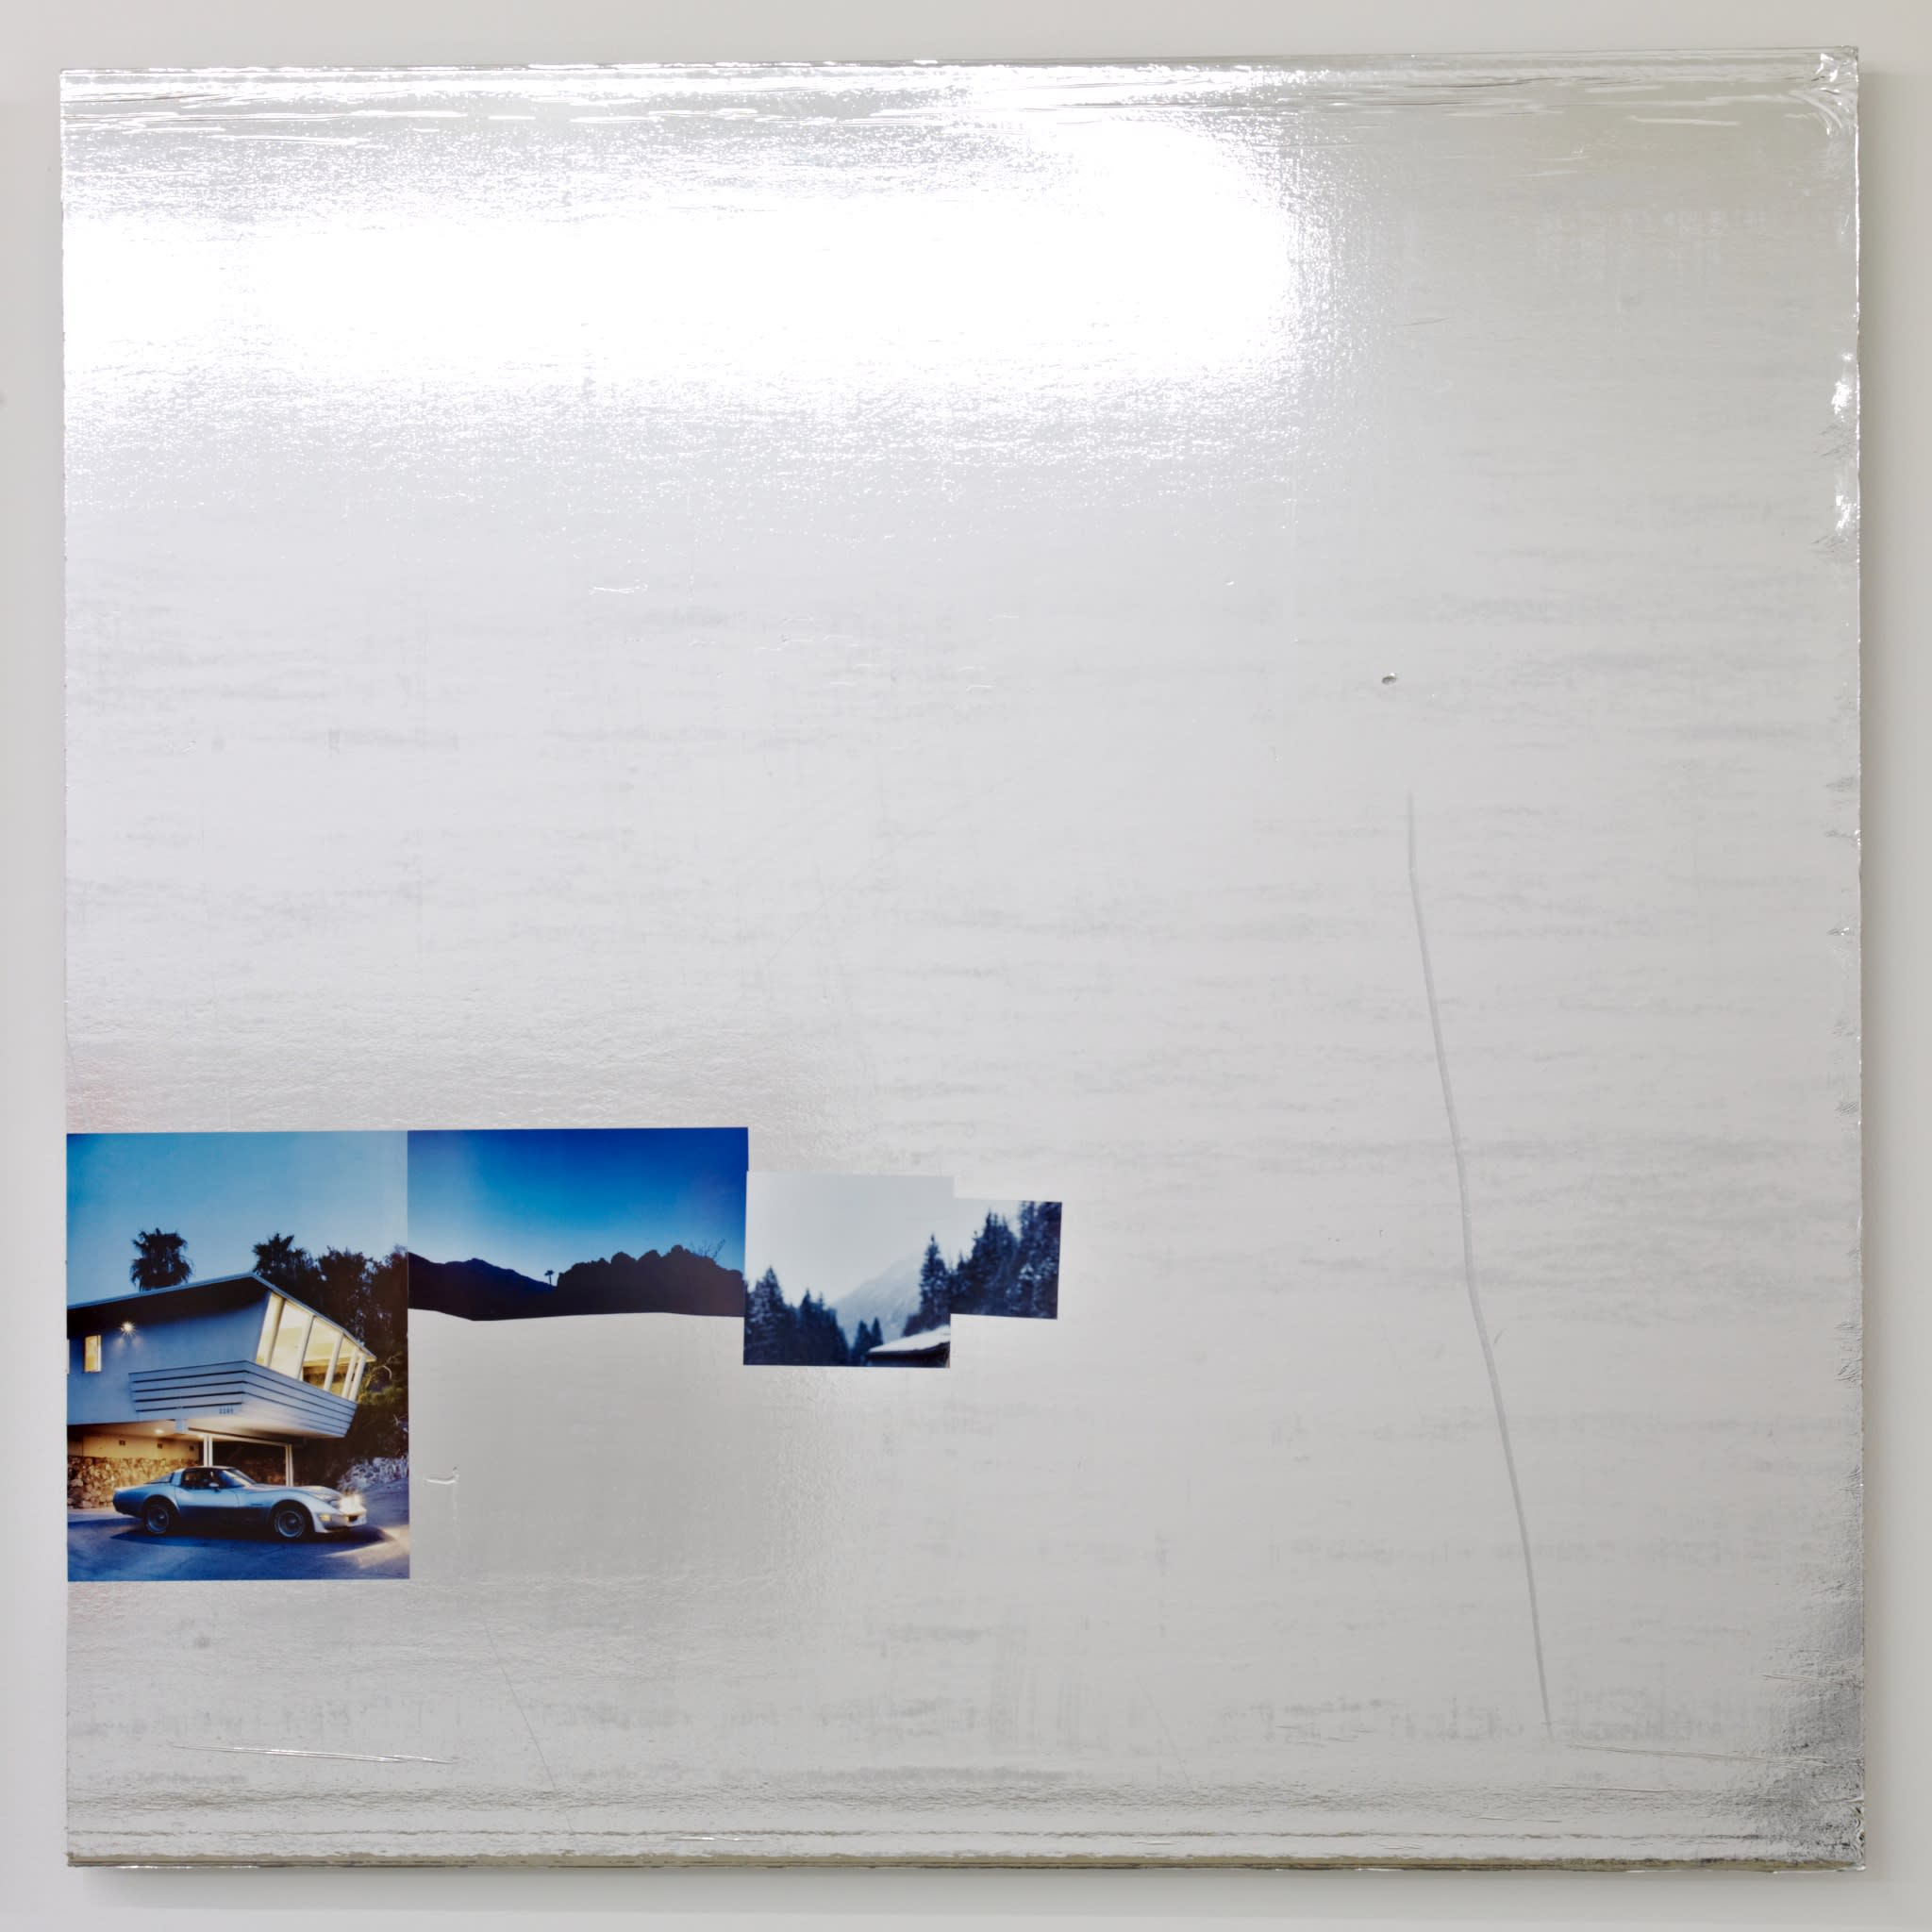 <span class=&#34;link fancybox-details-link&#34;><a href=&#34;/artists/16-paul-merrick/works/8432/&#34;>View Detail Page</a></span><div class=&#34;artist&#34;><strong>Paul Merrick</strong></div> <div class=&#34;title&#34;><em>Untitled (Double Indemnity)</em>, 2014</div> <div class=&#34;medium&#34;>Baseboard, found images</div> <div class=&#34;dimensions&#34;>120 x 120 cm<br />47 1/4 x 47 1/4 in</div><div class=&#34;copyright_line&#34;>Copyright The Artist</div>